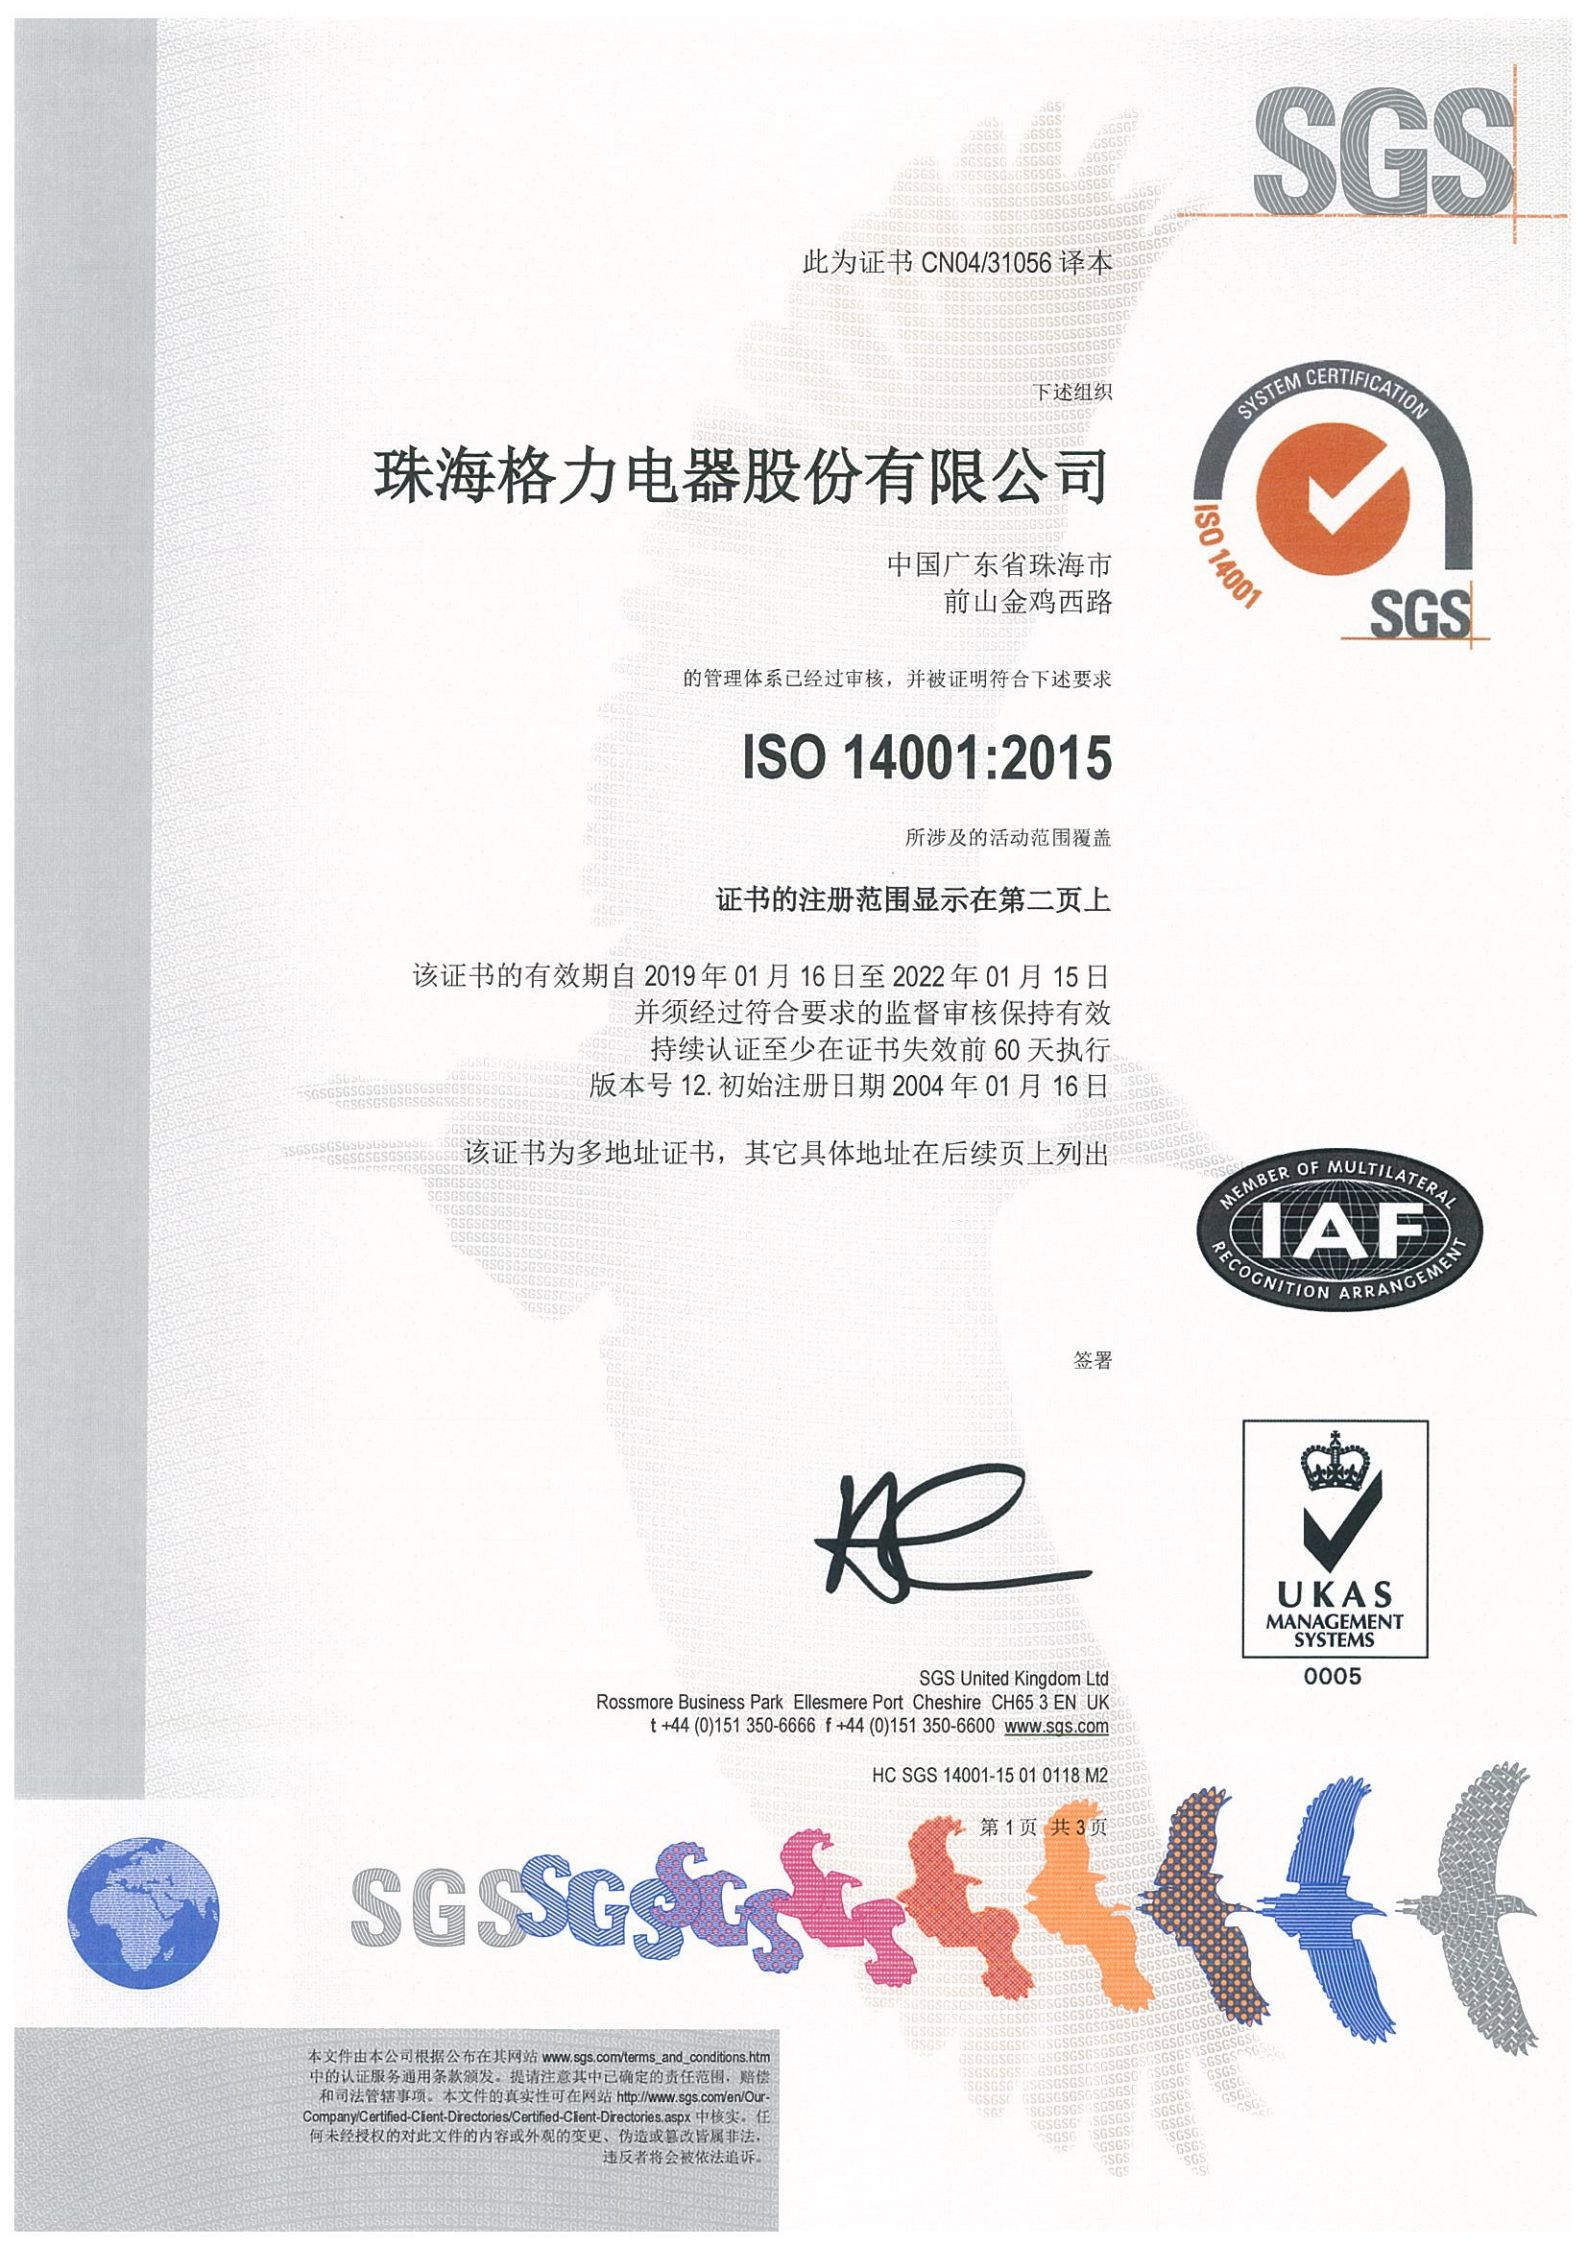 iso14001(環境體系)榮譽證書